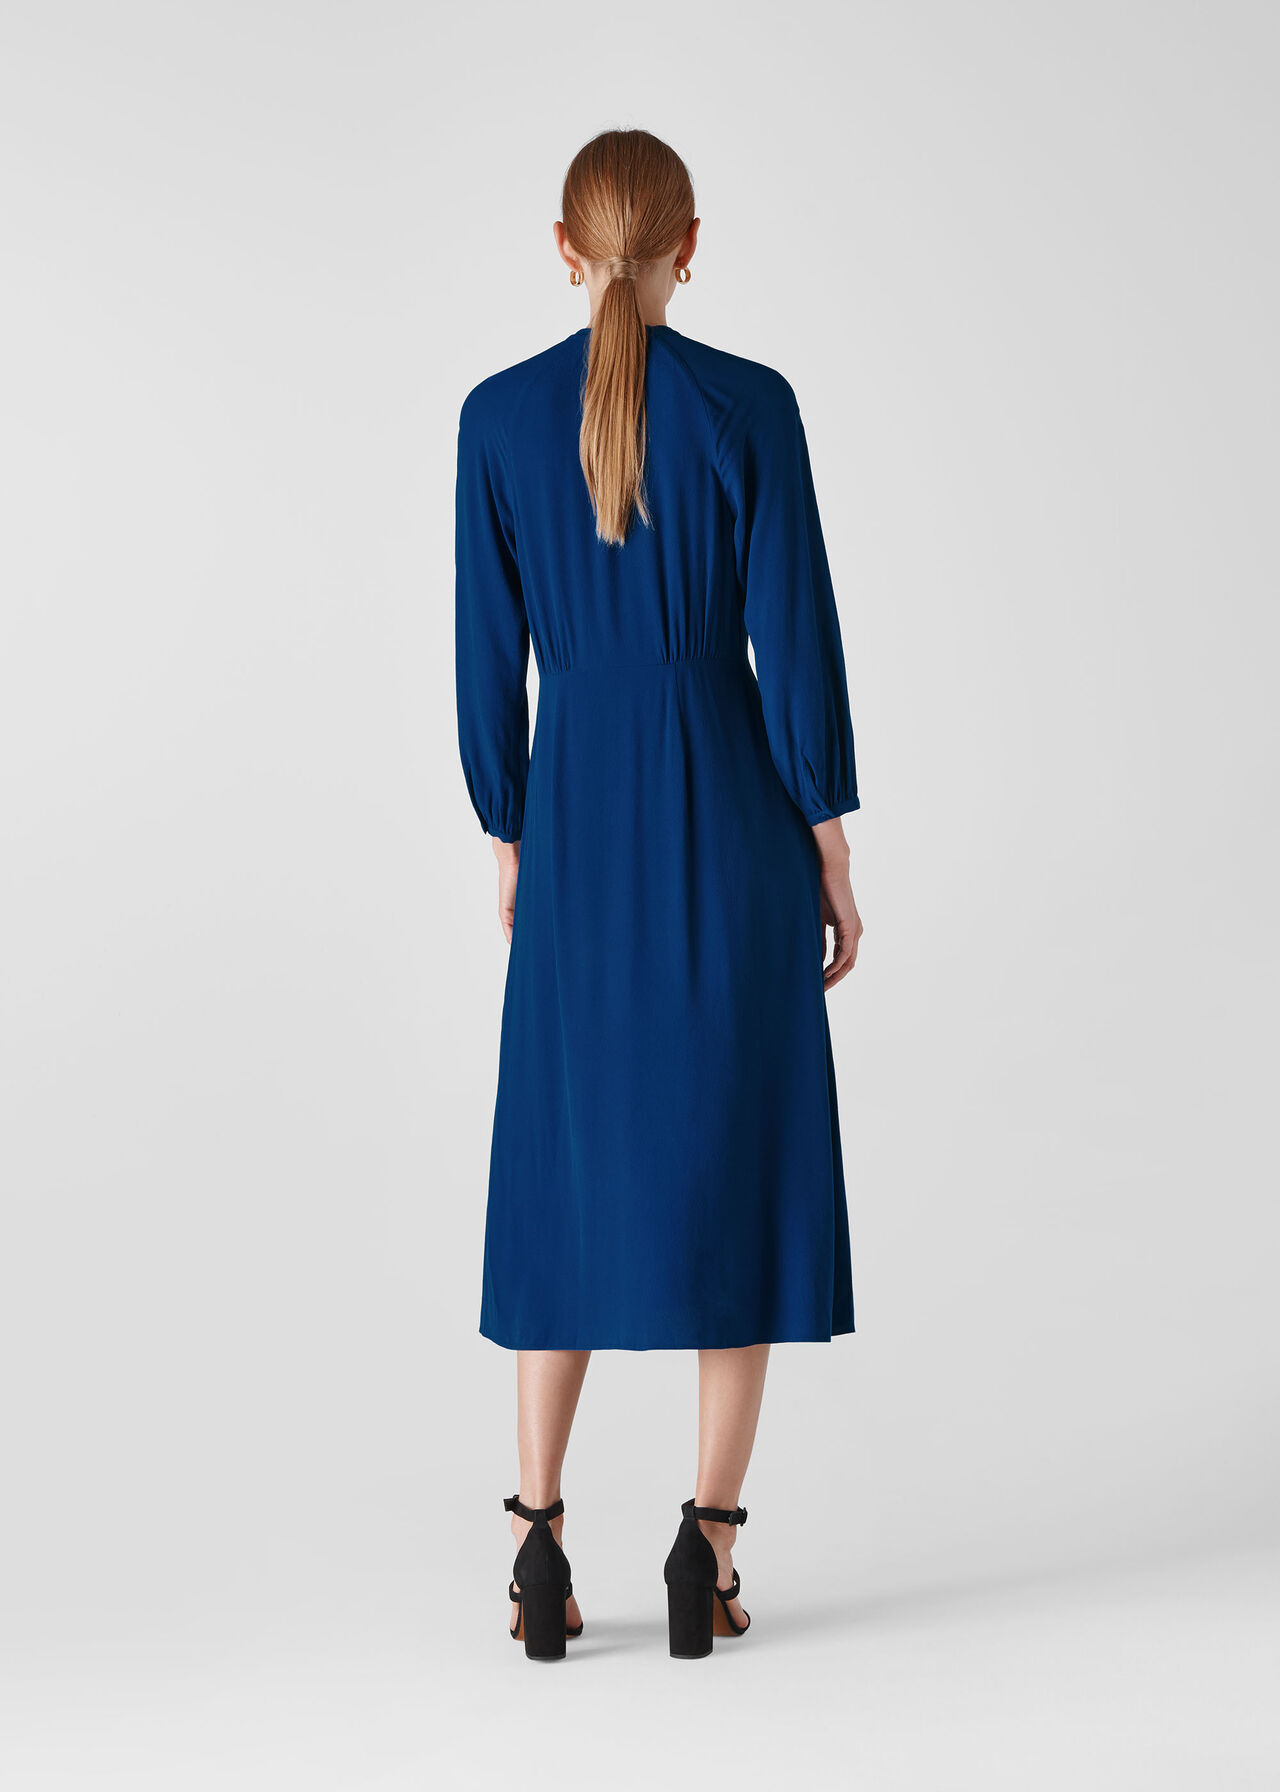 Eloise Textured Dress Dark Blue